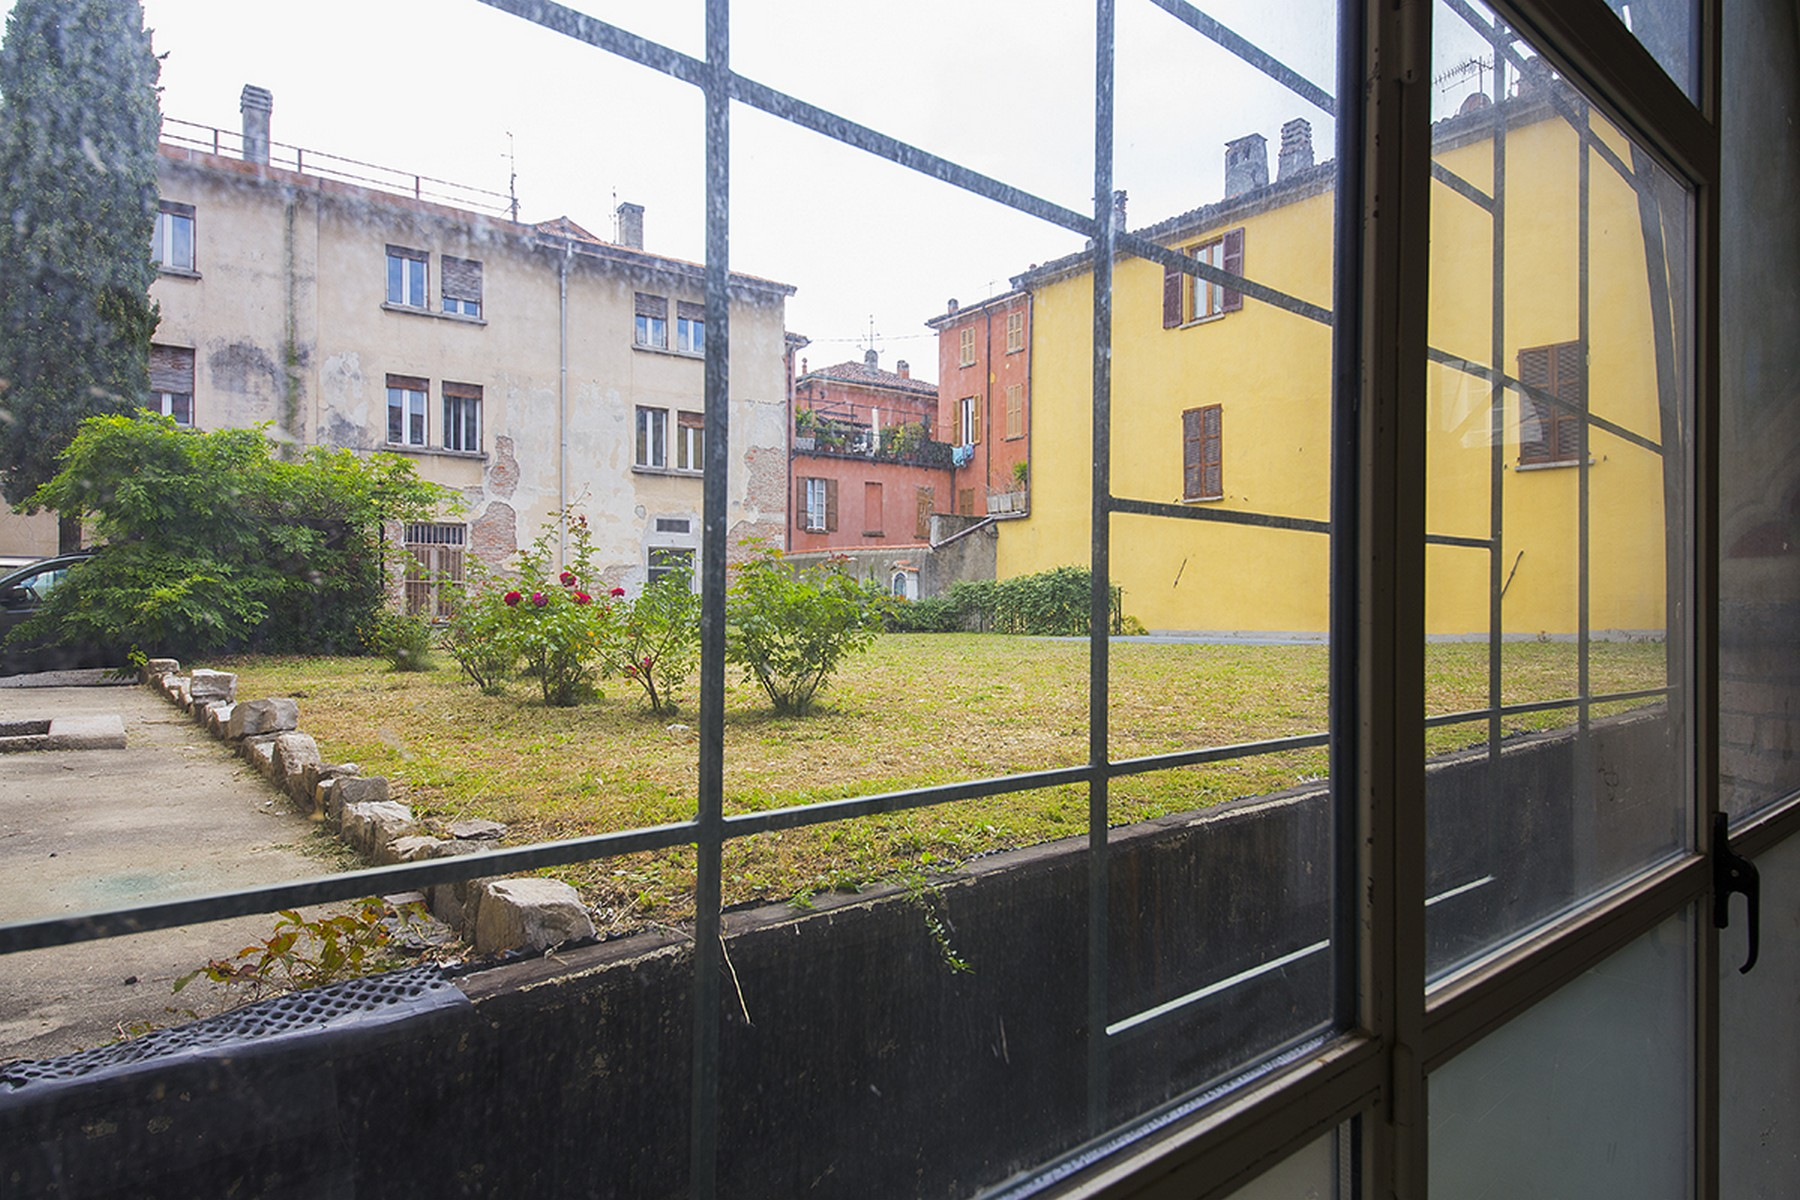 Additional photo for property listing at Magnificent semi-detached house in the historic center of Como Via Cinque Giornate Como, Como 22100 Italien